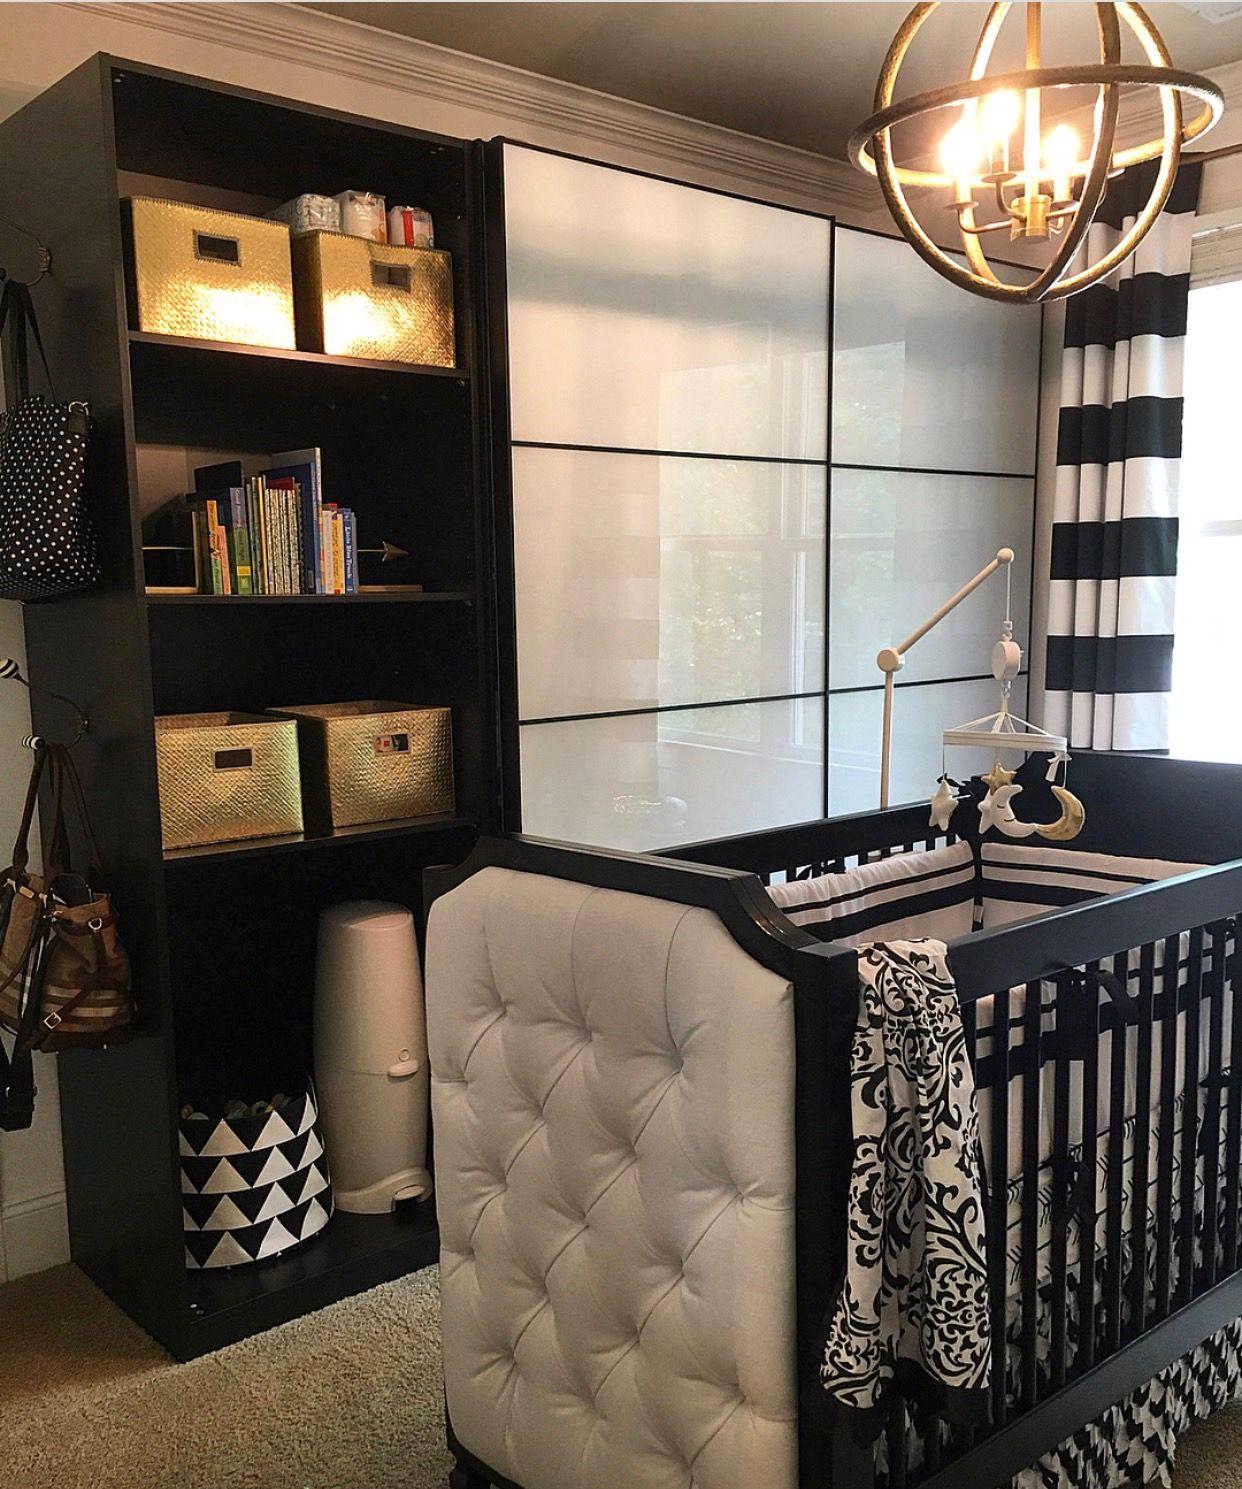 36+ Decor home furnishings address ideas in 2021